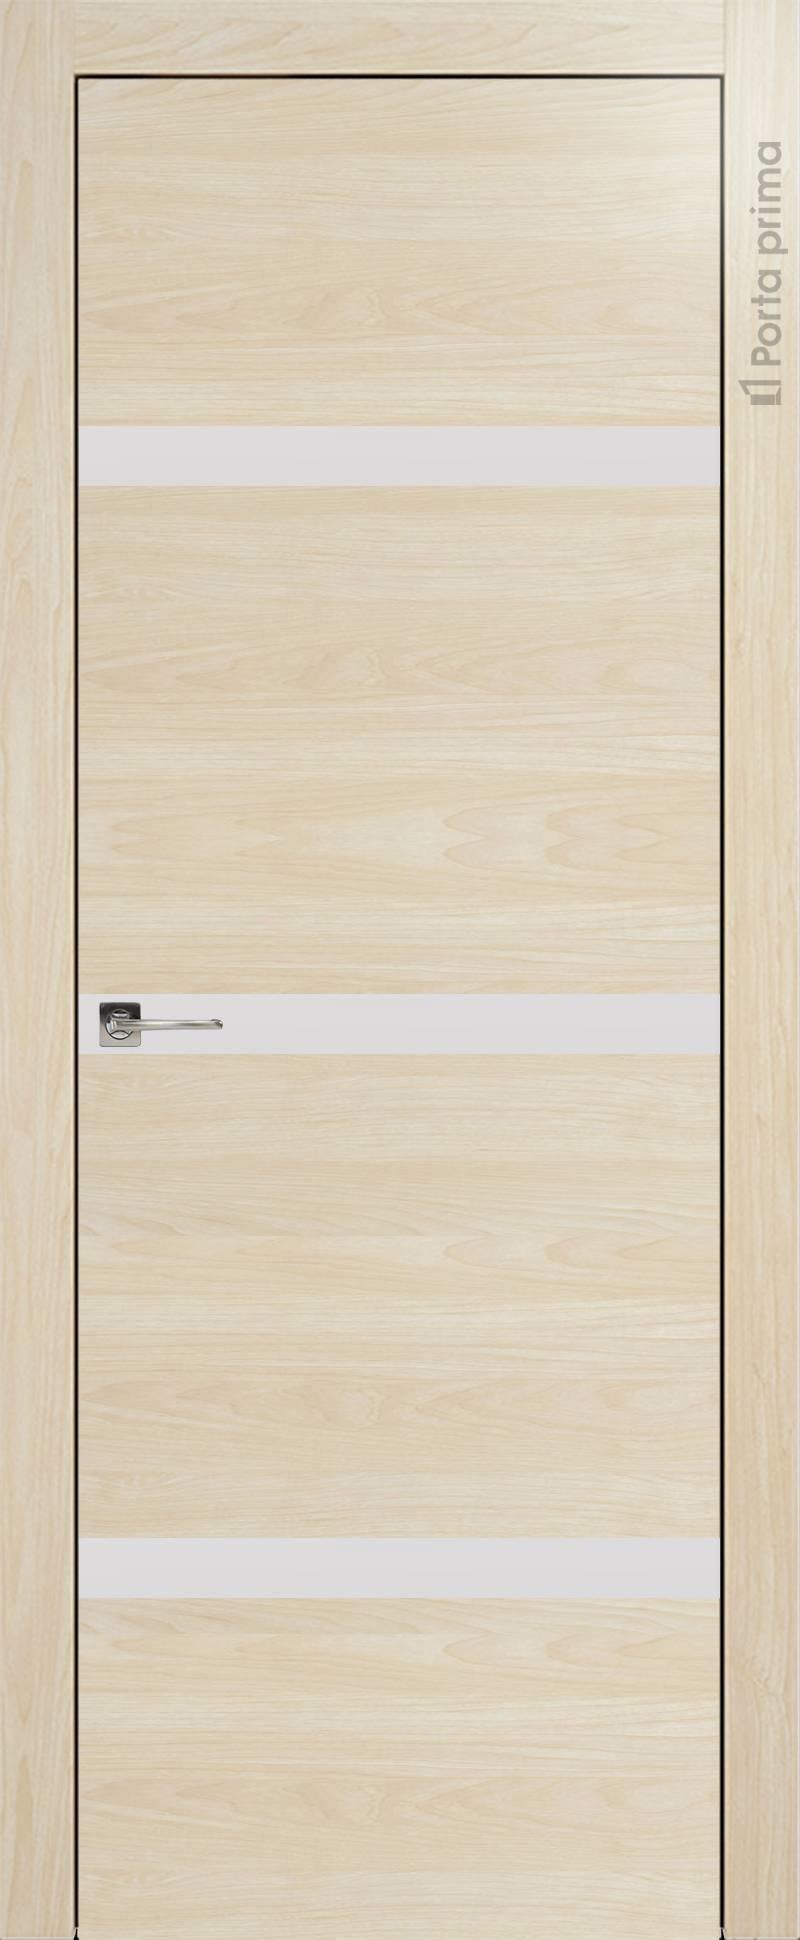 Tivoli Г-4 цвет - Клен Без стекла (ДГ)